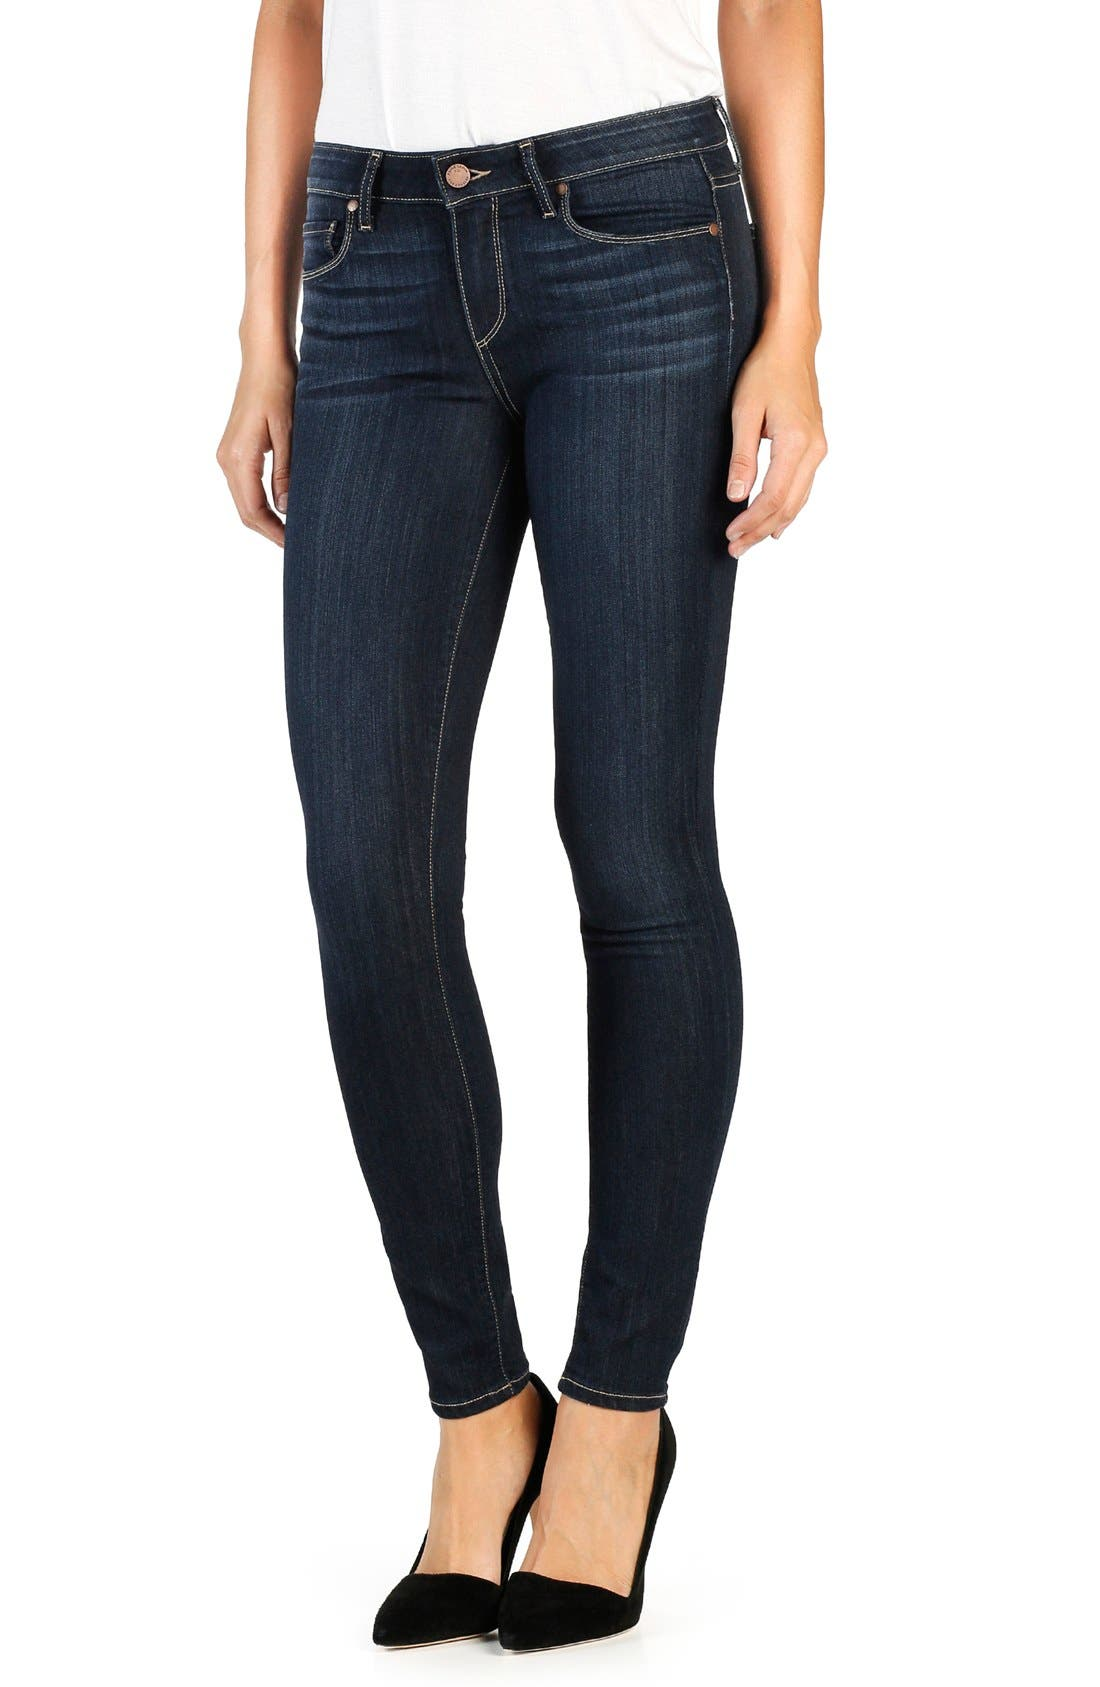 Main Image - PAIGE Transcend Verdugo Ultra Skinny Jeans (Seneca)